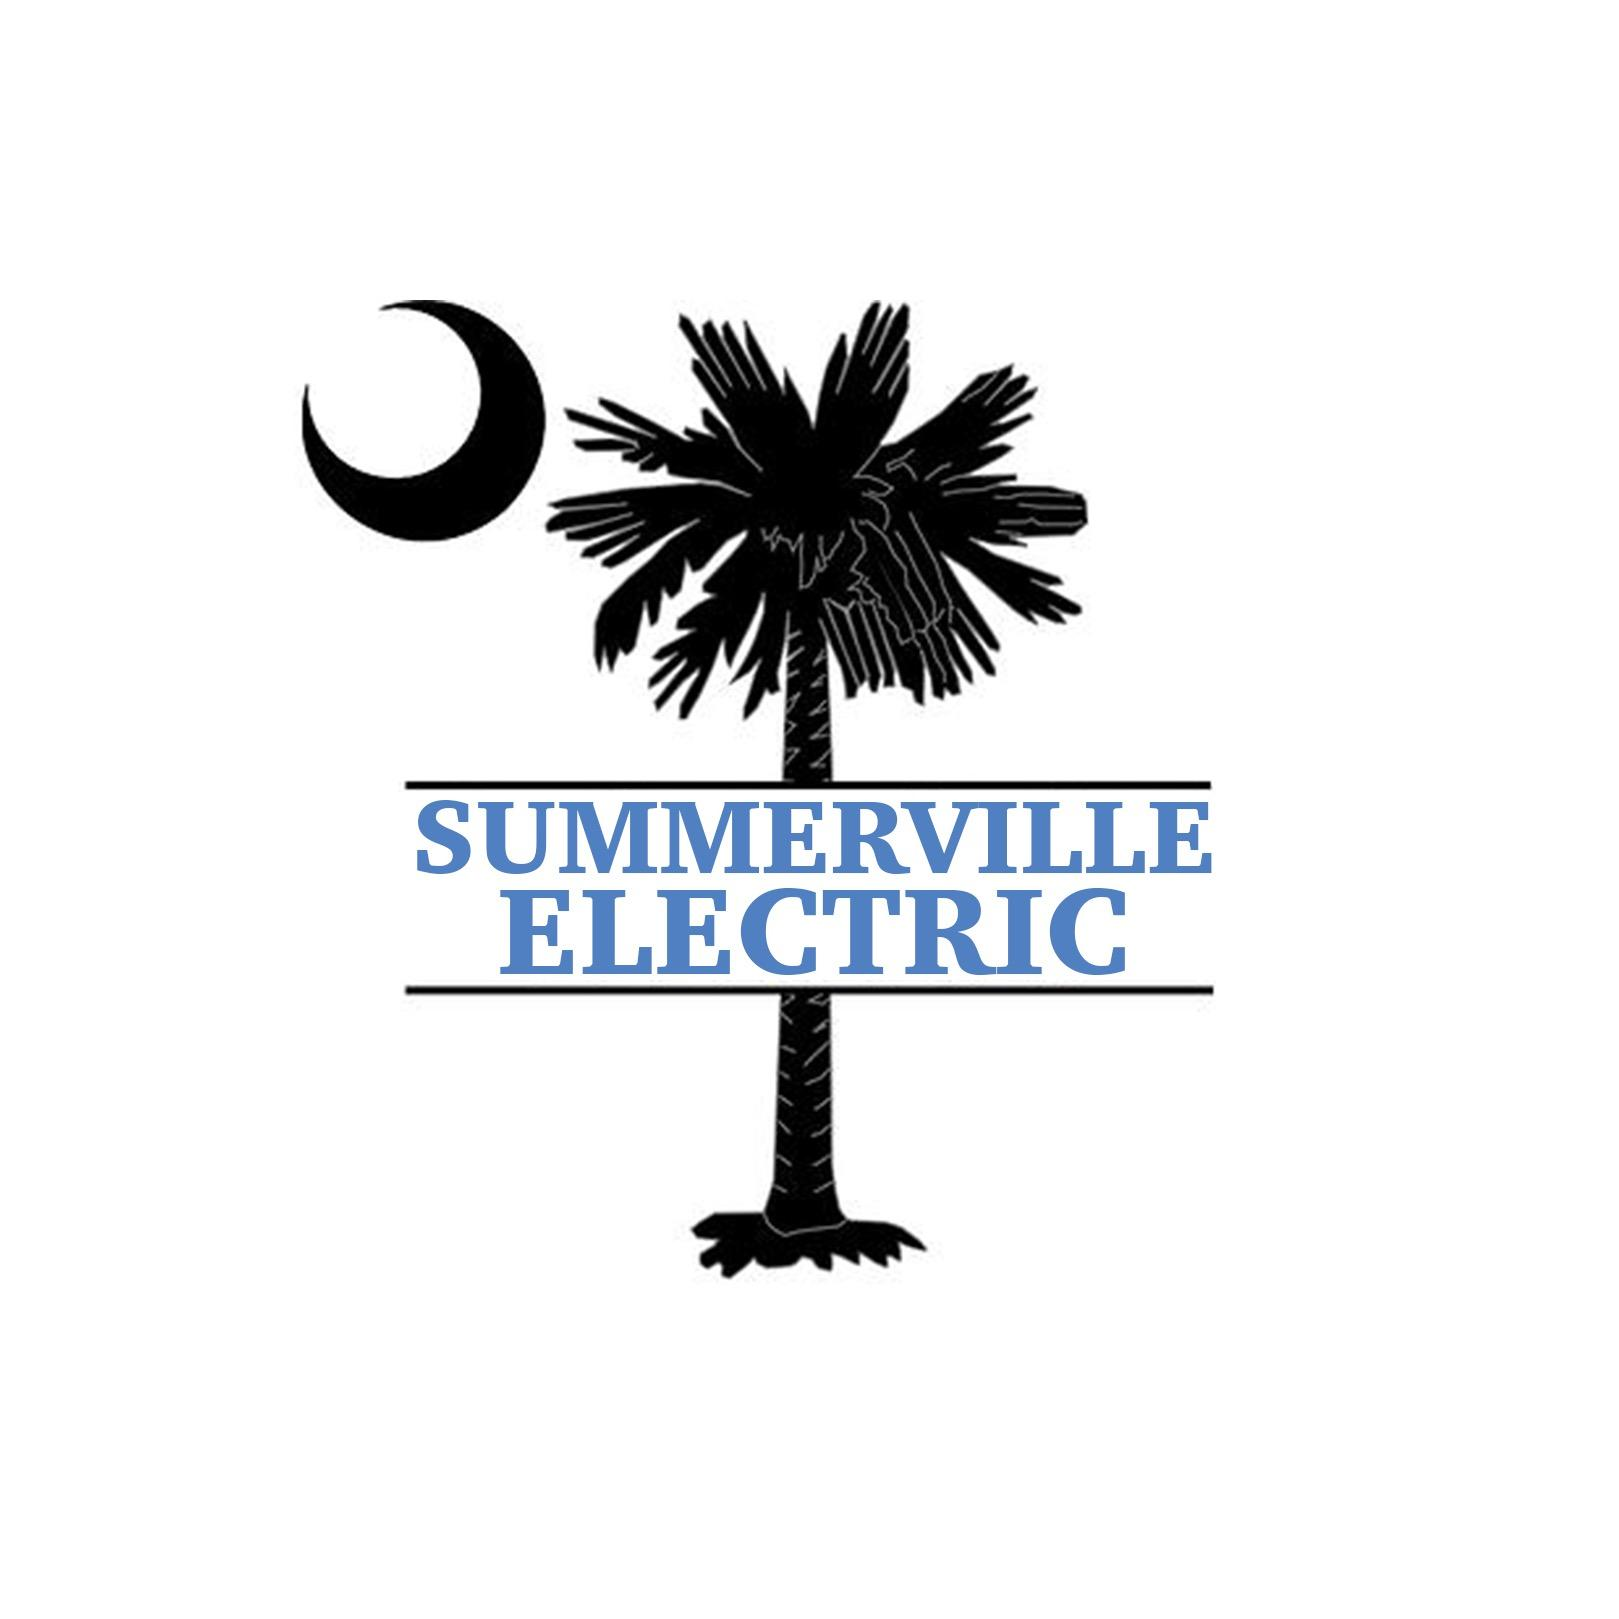 Summerville Electric